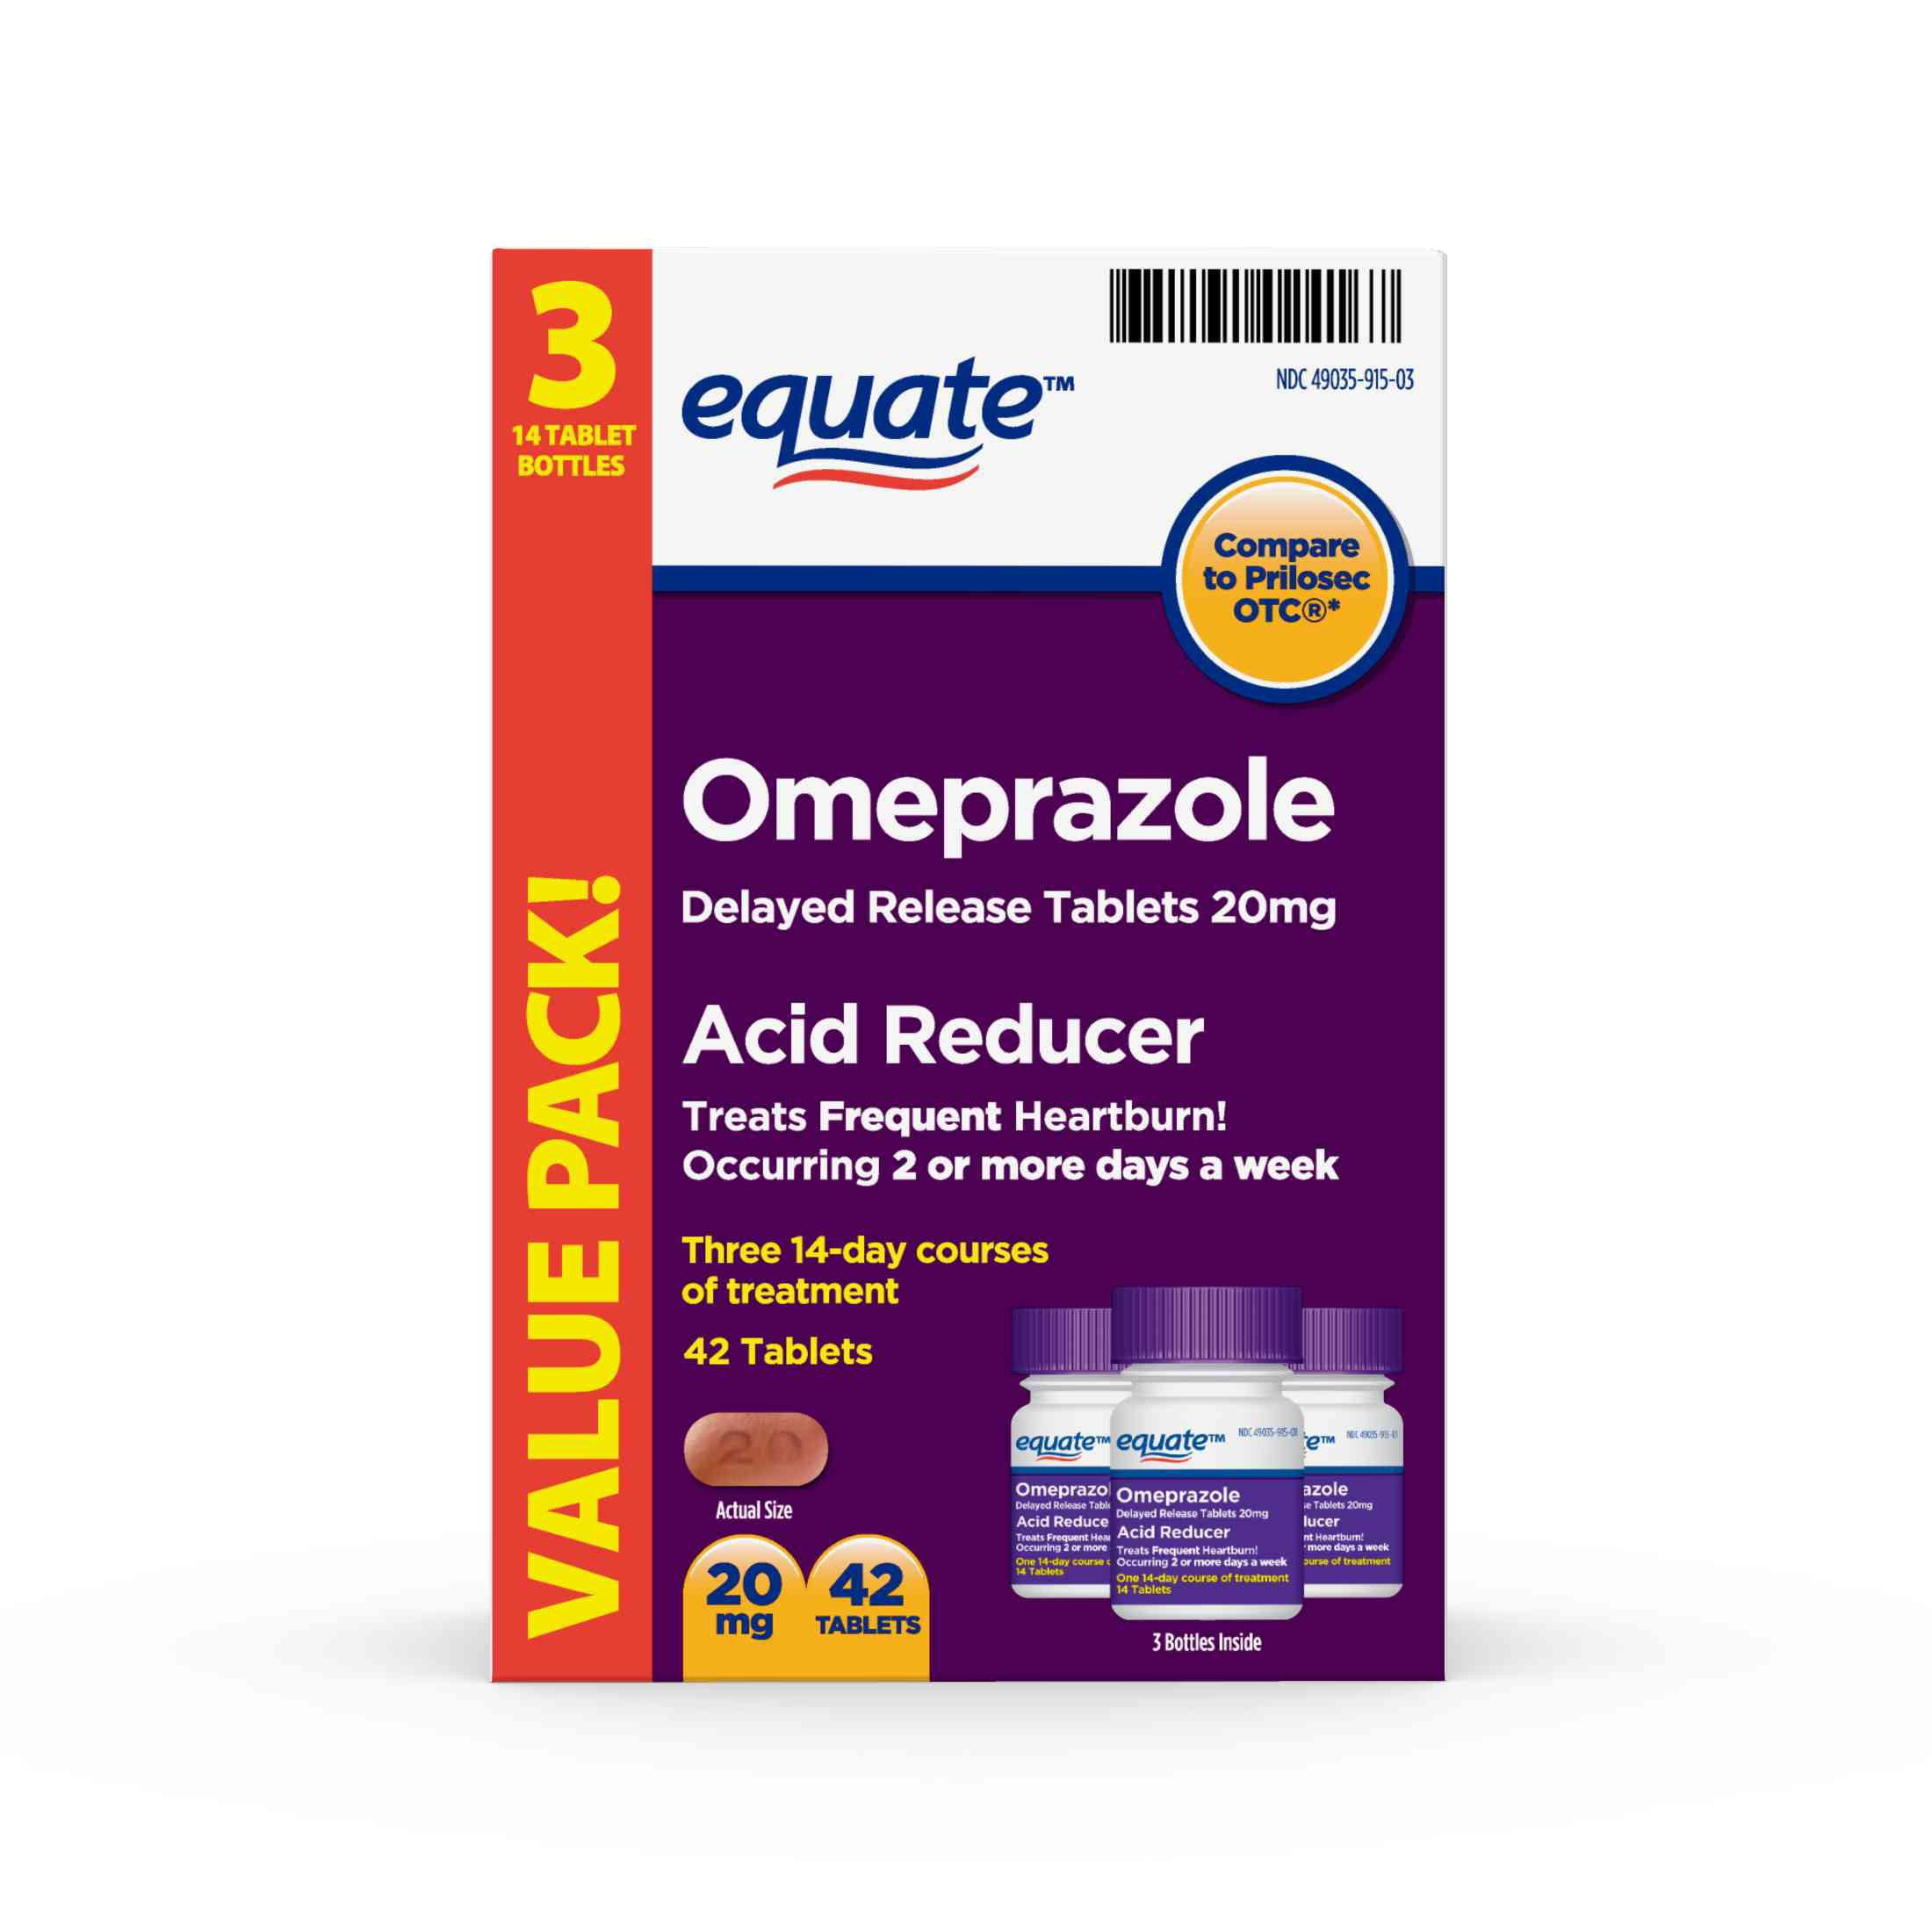 Equate Acid Reducer Omeprazole Delayed Release Tablets, 20 mg, 42 Ct